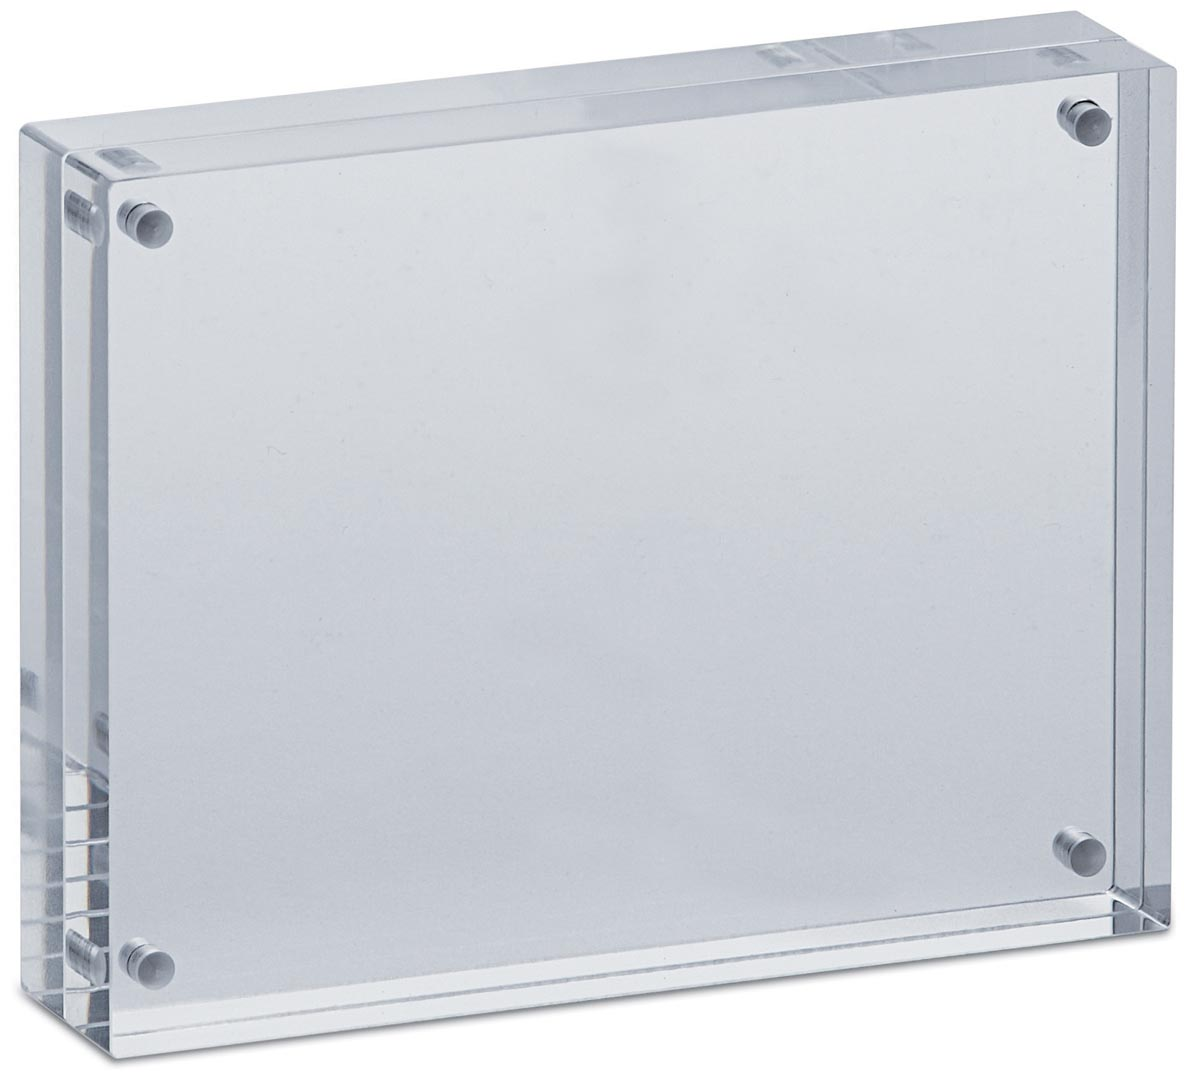 Fotolijst Maul 15x11.5x2.4cm acryl glashelder